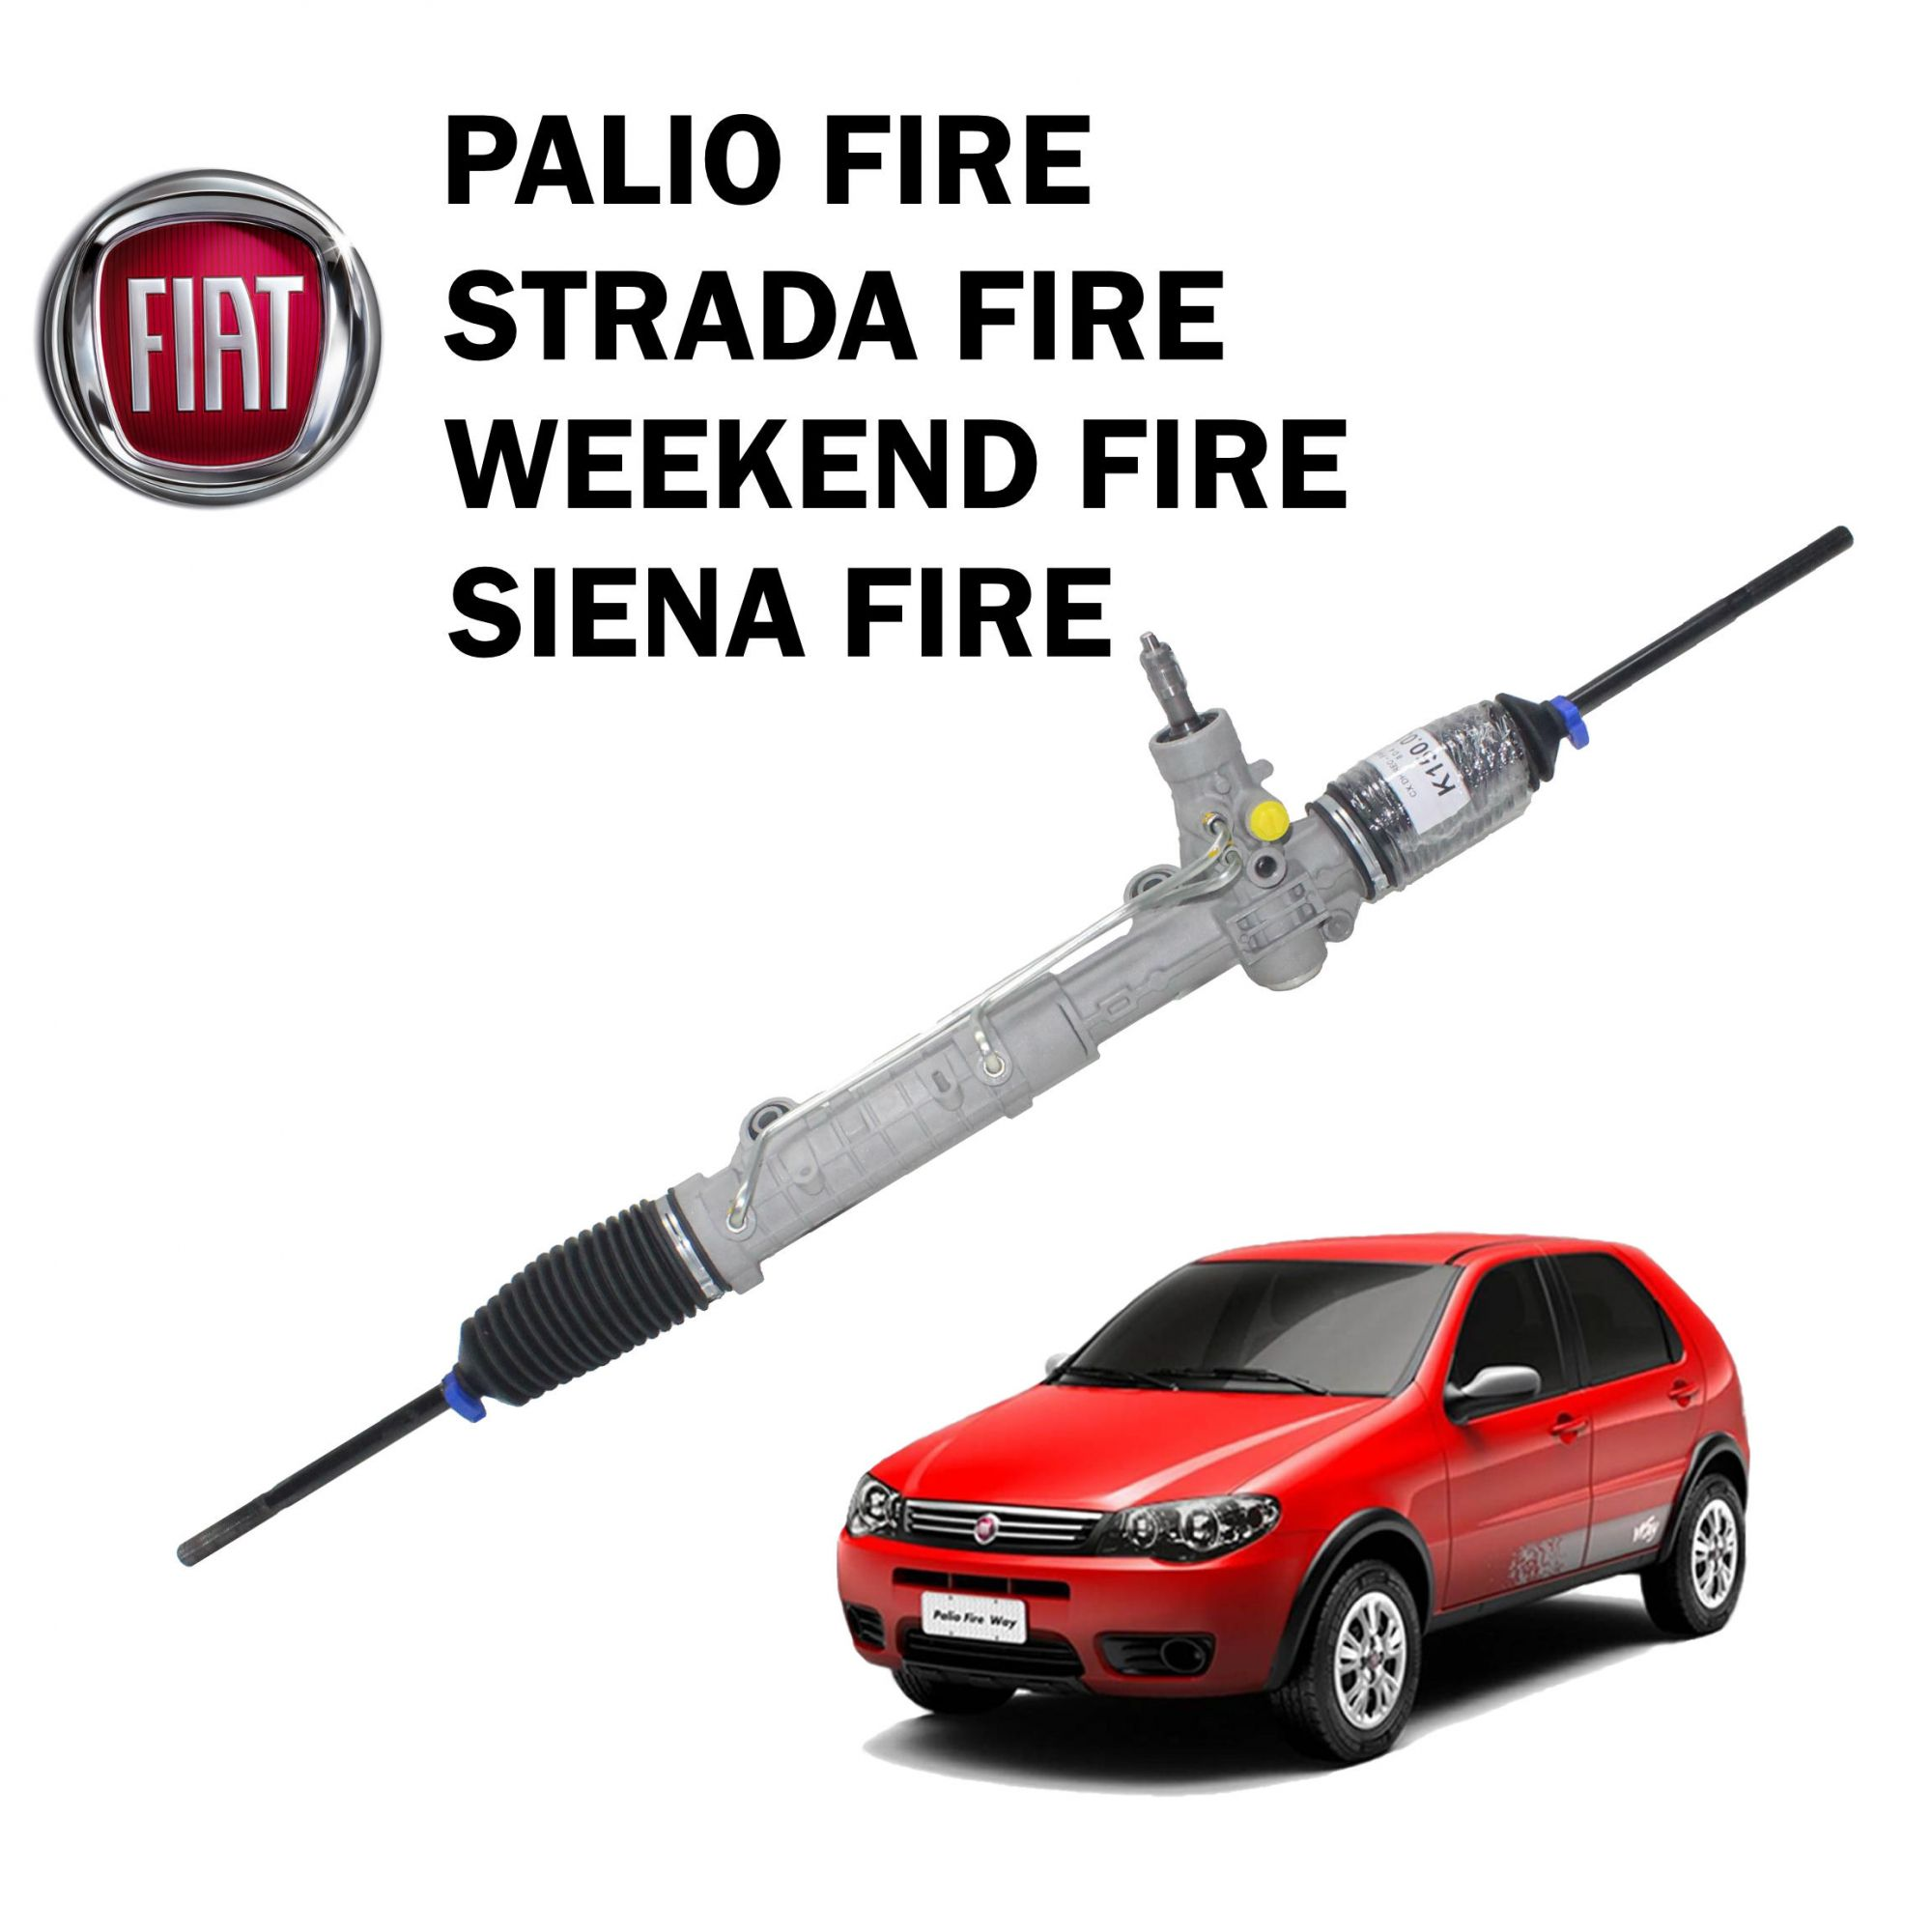 Caixa Direção Hidráulica TRW Palio Fire, Strada , Siena, Weekend